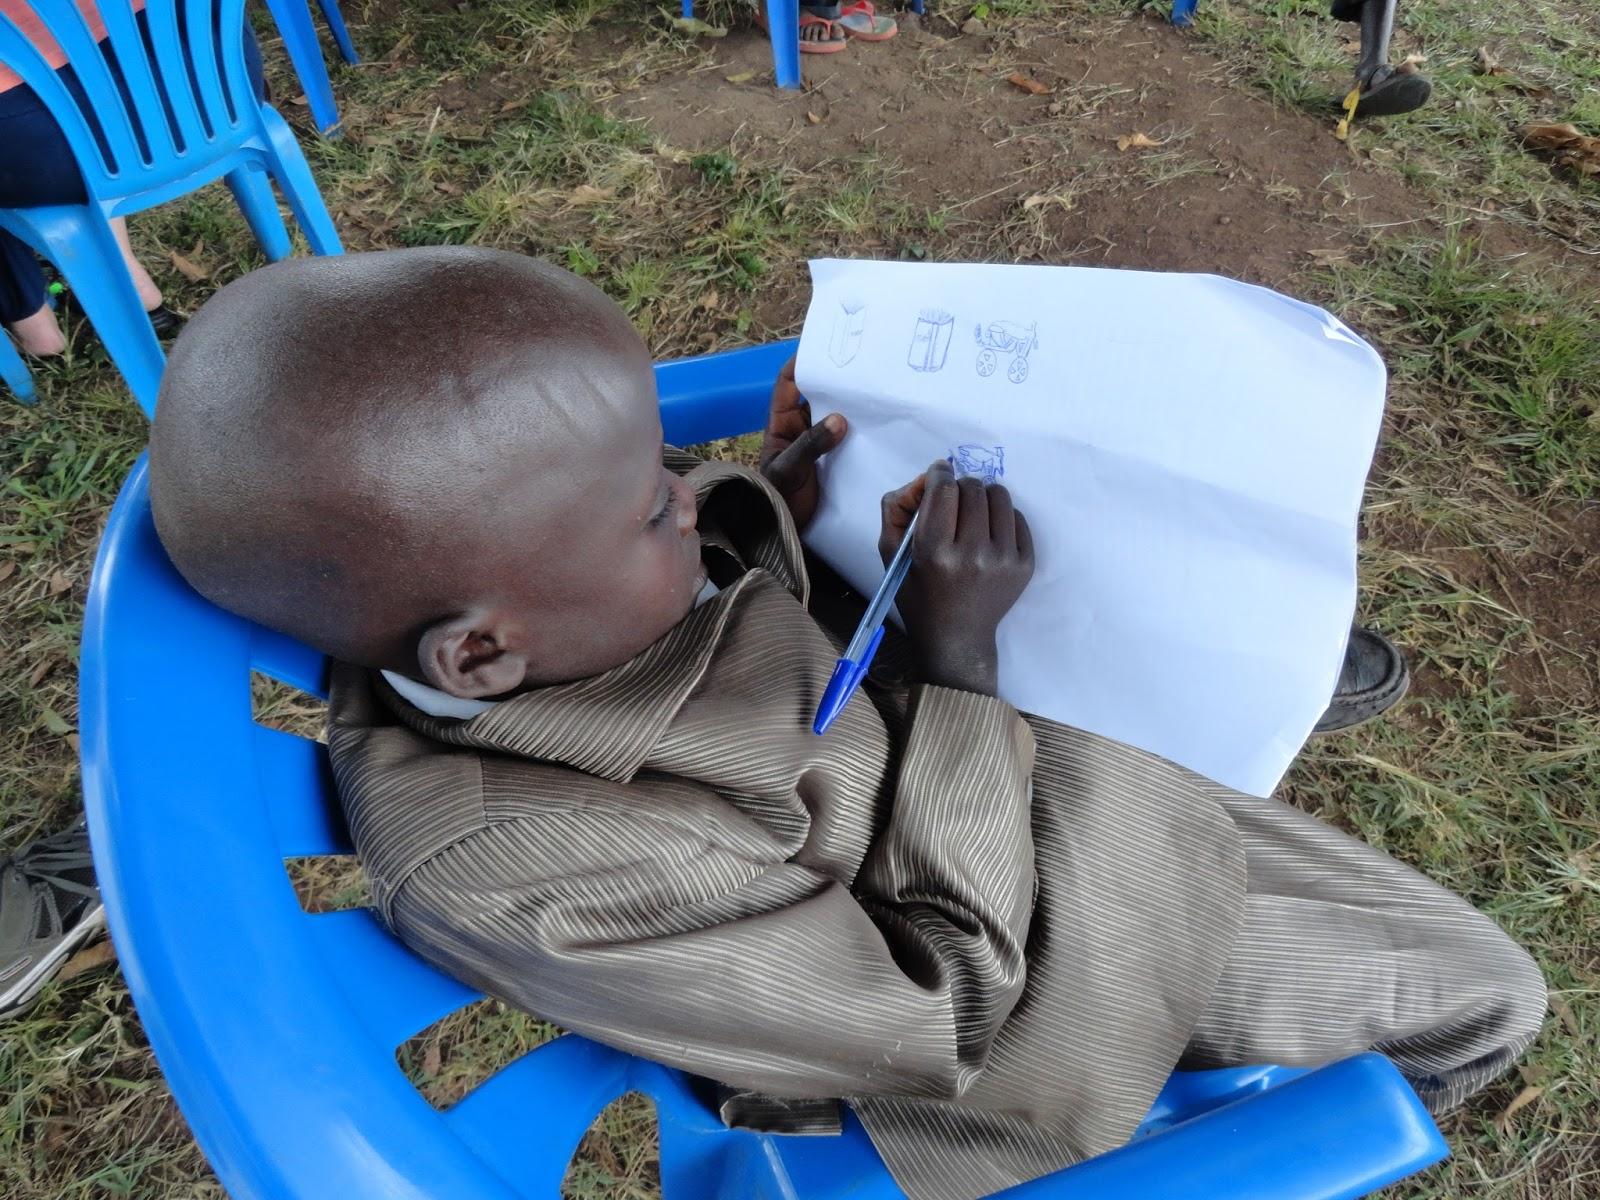 world vision, compassion international child sponsorship